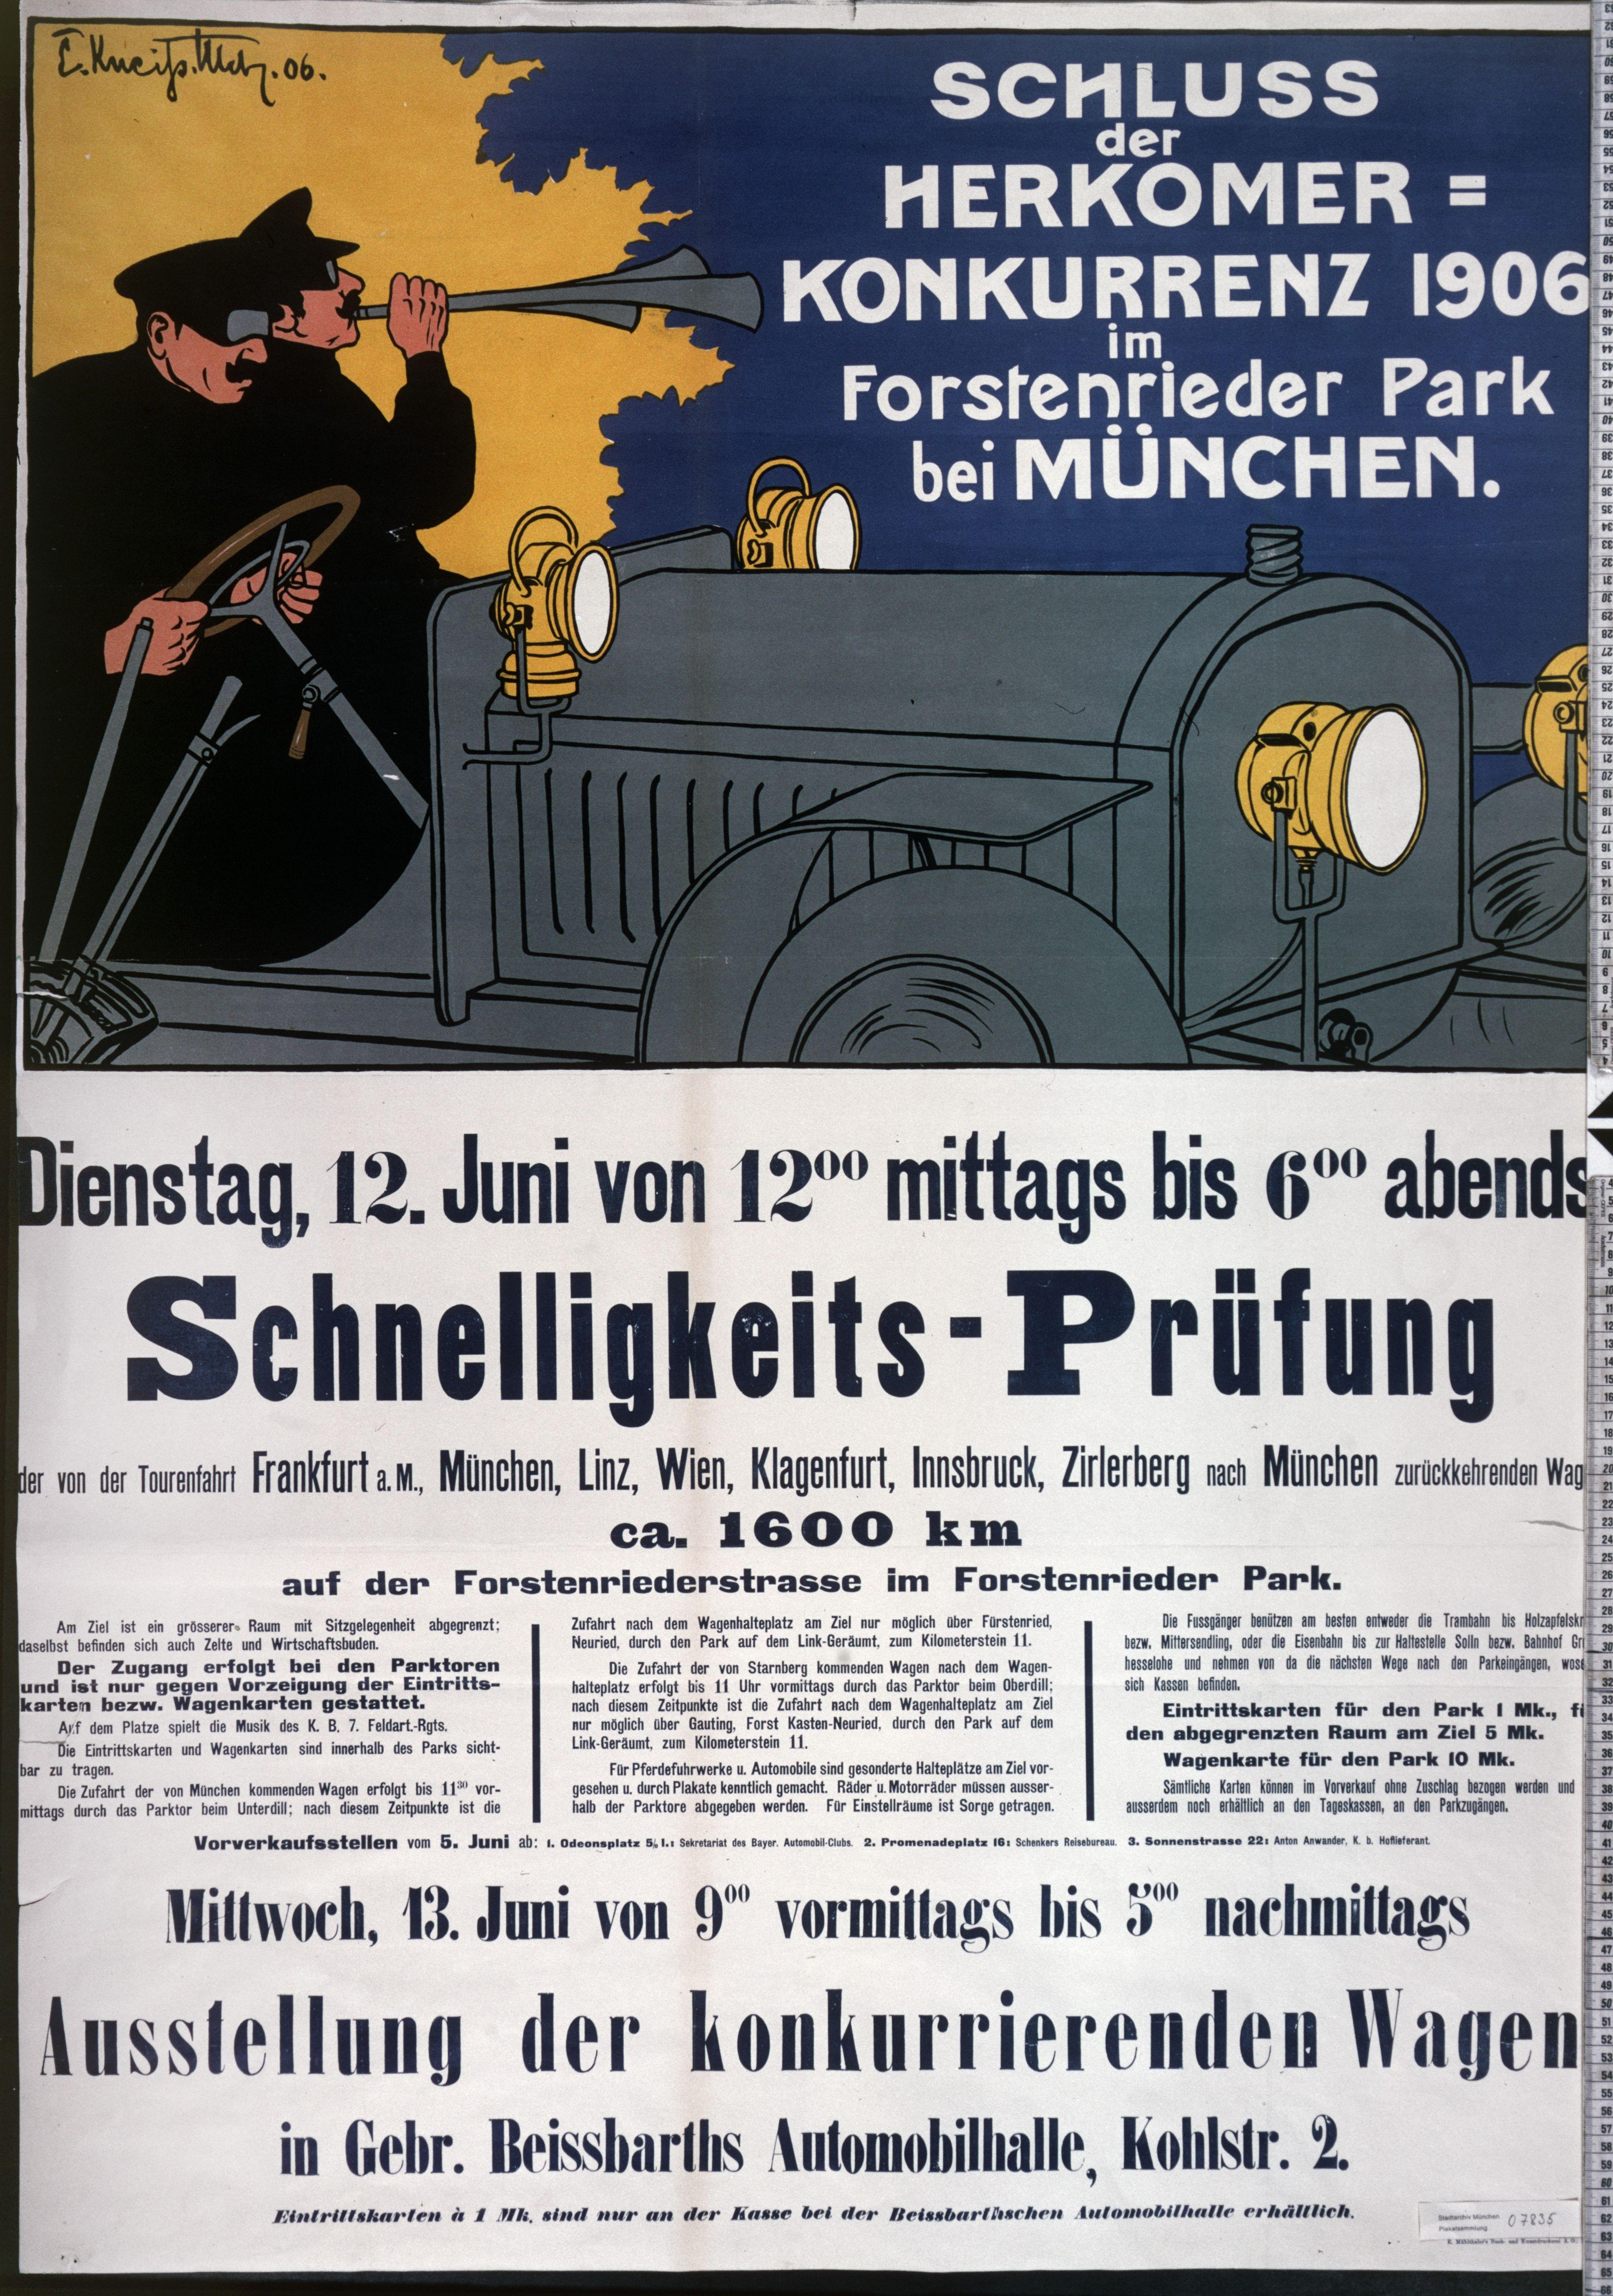 Plakat: Schluss der Herkomer-Konkurrenz 1906